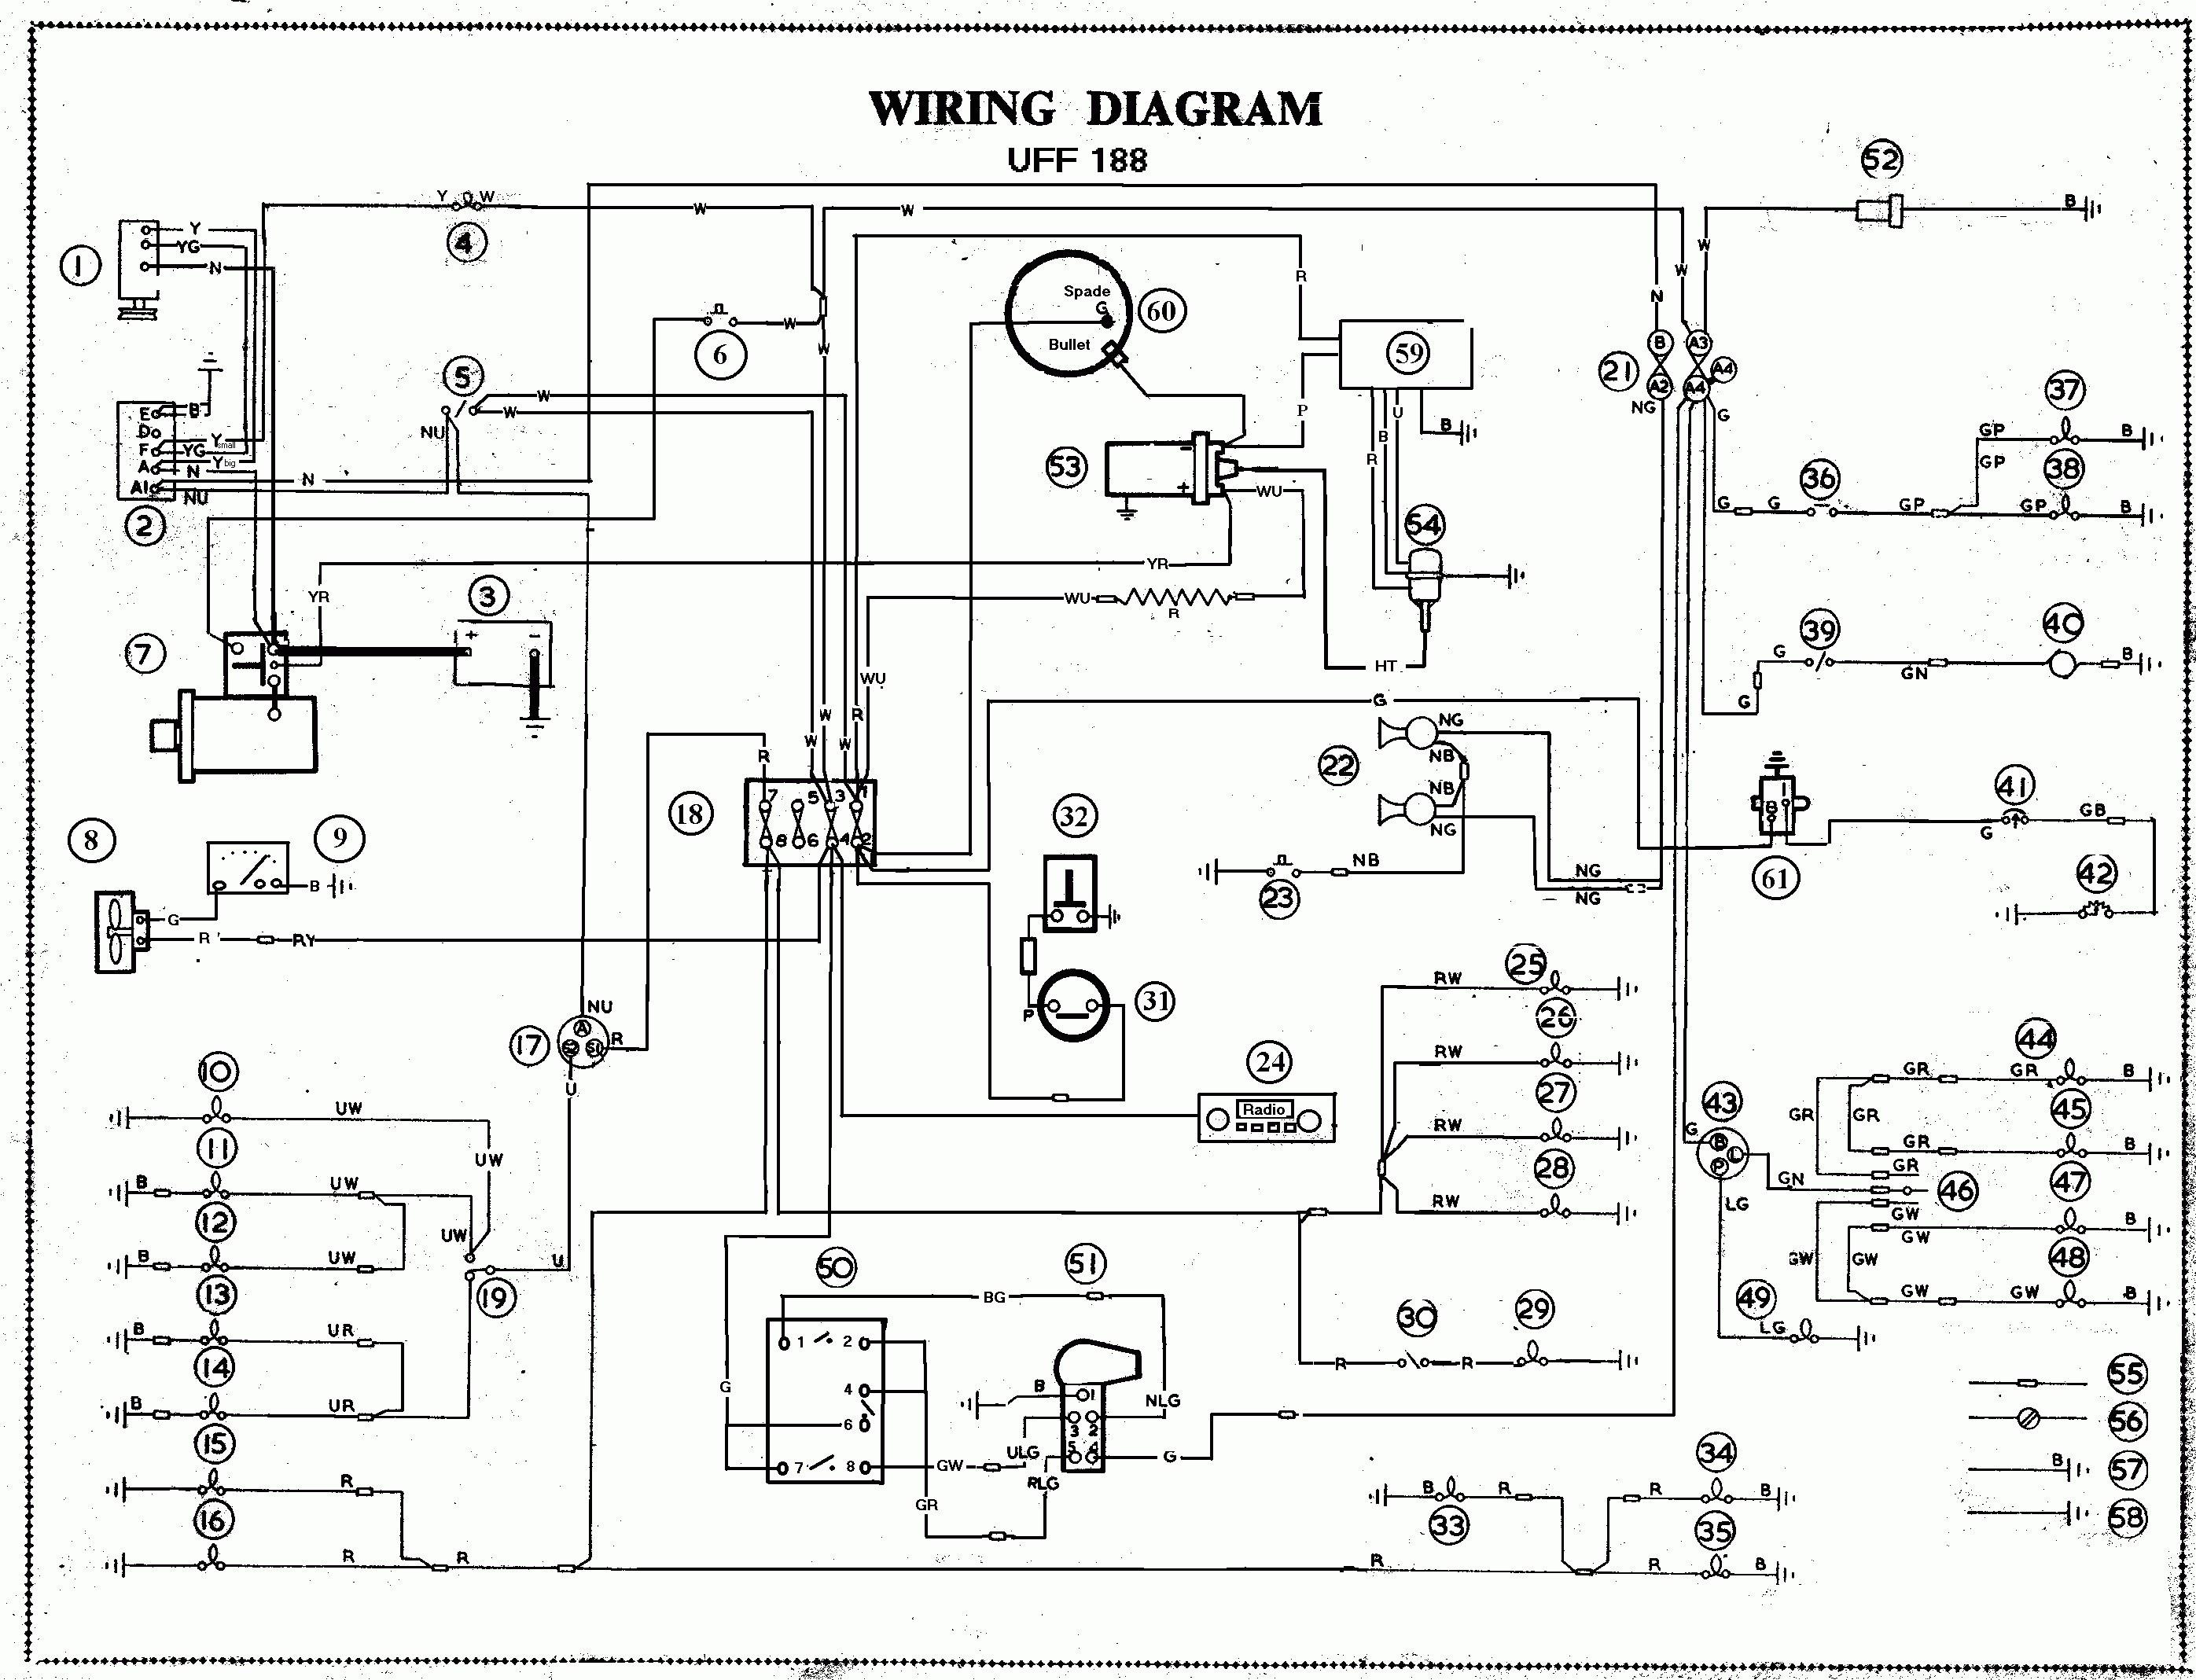 lowe pontoon ss184 wiring diagram circuit diagram template Boat Wiring Diagram for Dummies lowe pontoon wiring diagram wiring diagramspontoon boat diagram 5 6 malawi24 de \\\\u2022wiring diagram